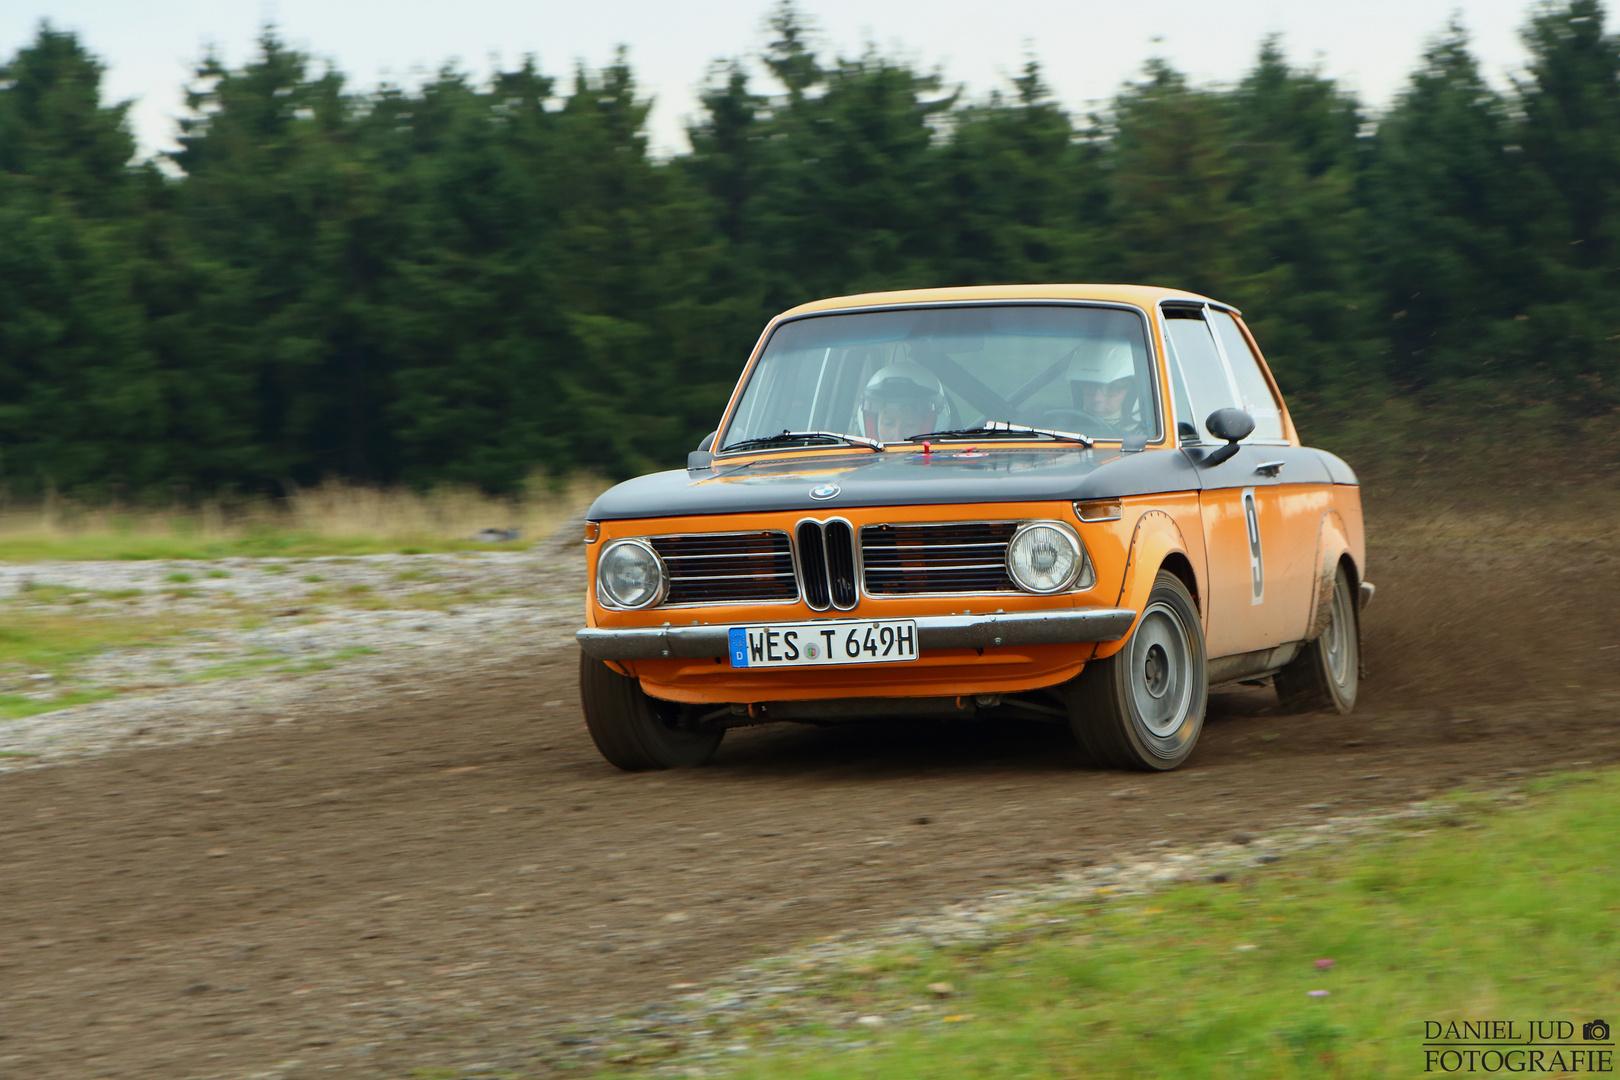 BMW 2002 ti - ADAC Rallye Siegerland-Westerwald